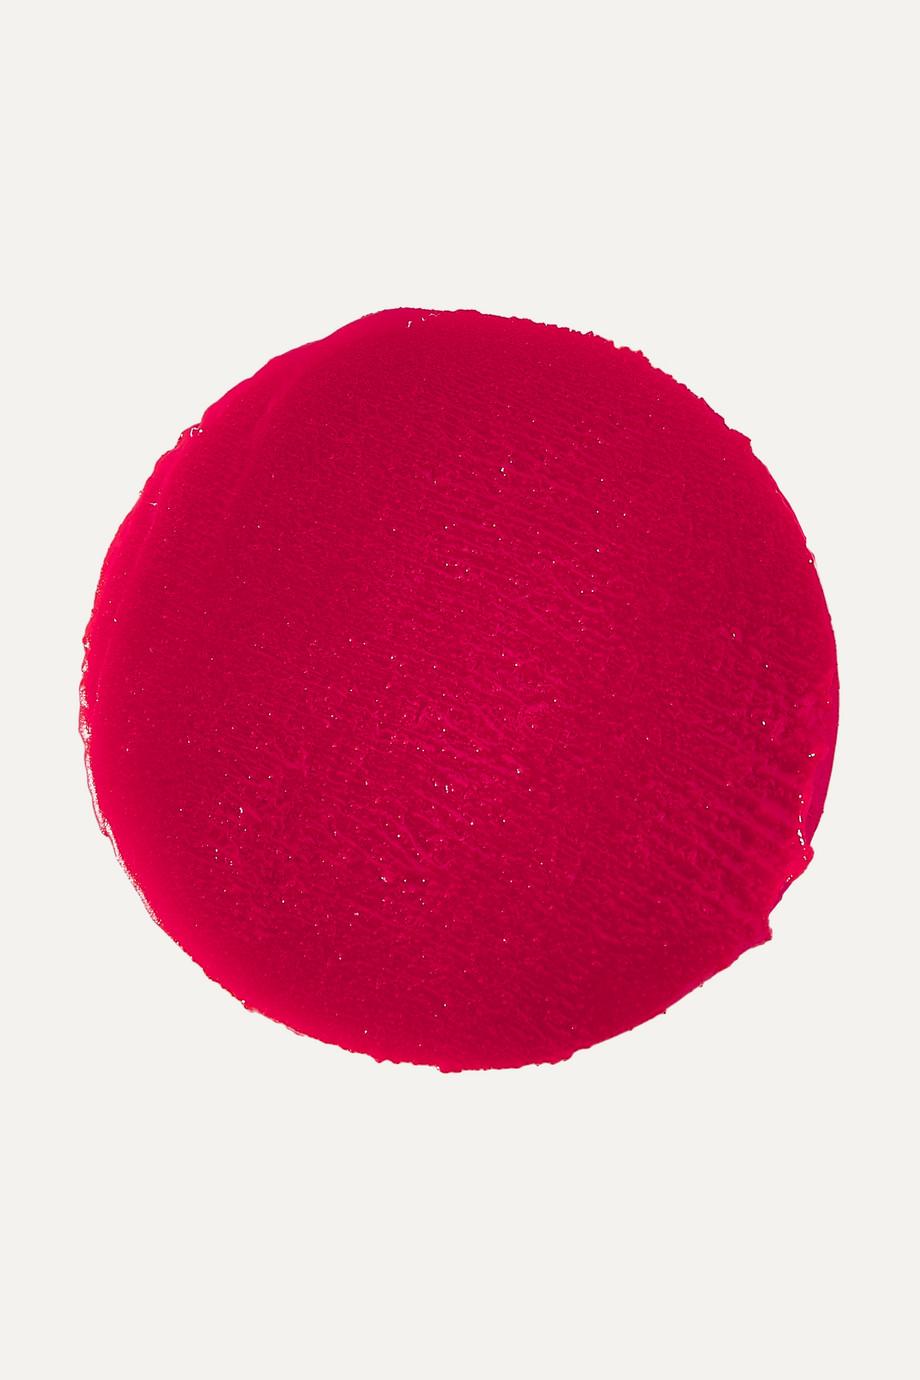 Christian Louboutin Beauty Silky Satin Lip Colour - Torerra